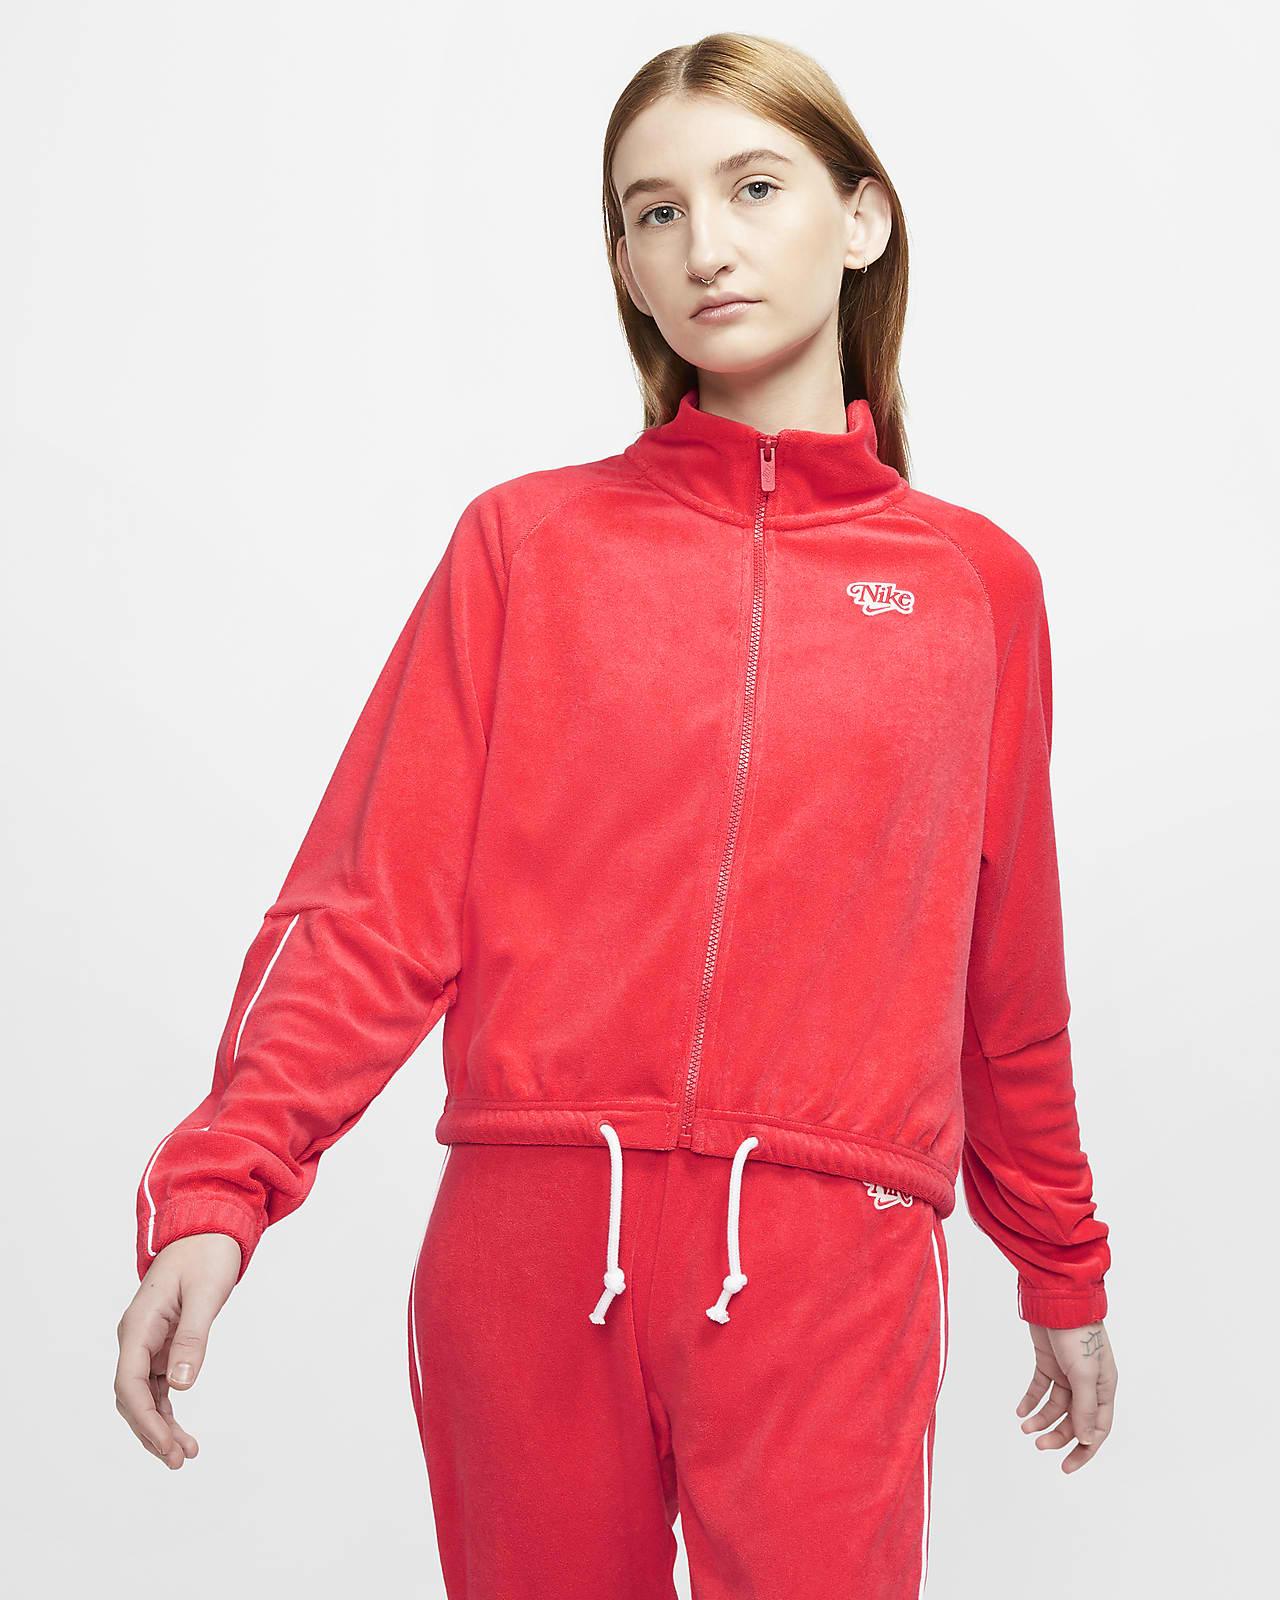 Nike Sportswear Damenjacke mit durchgehendem Reißverschluss